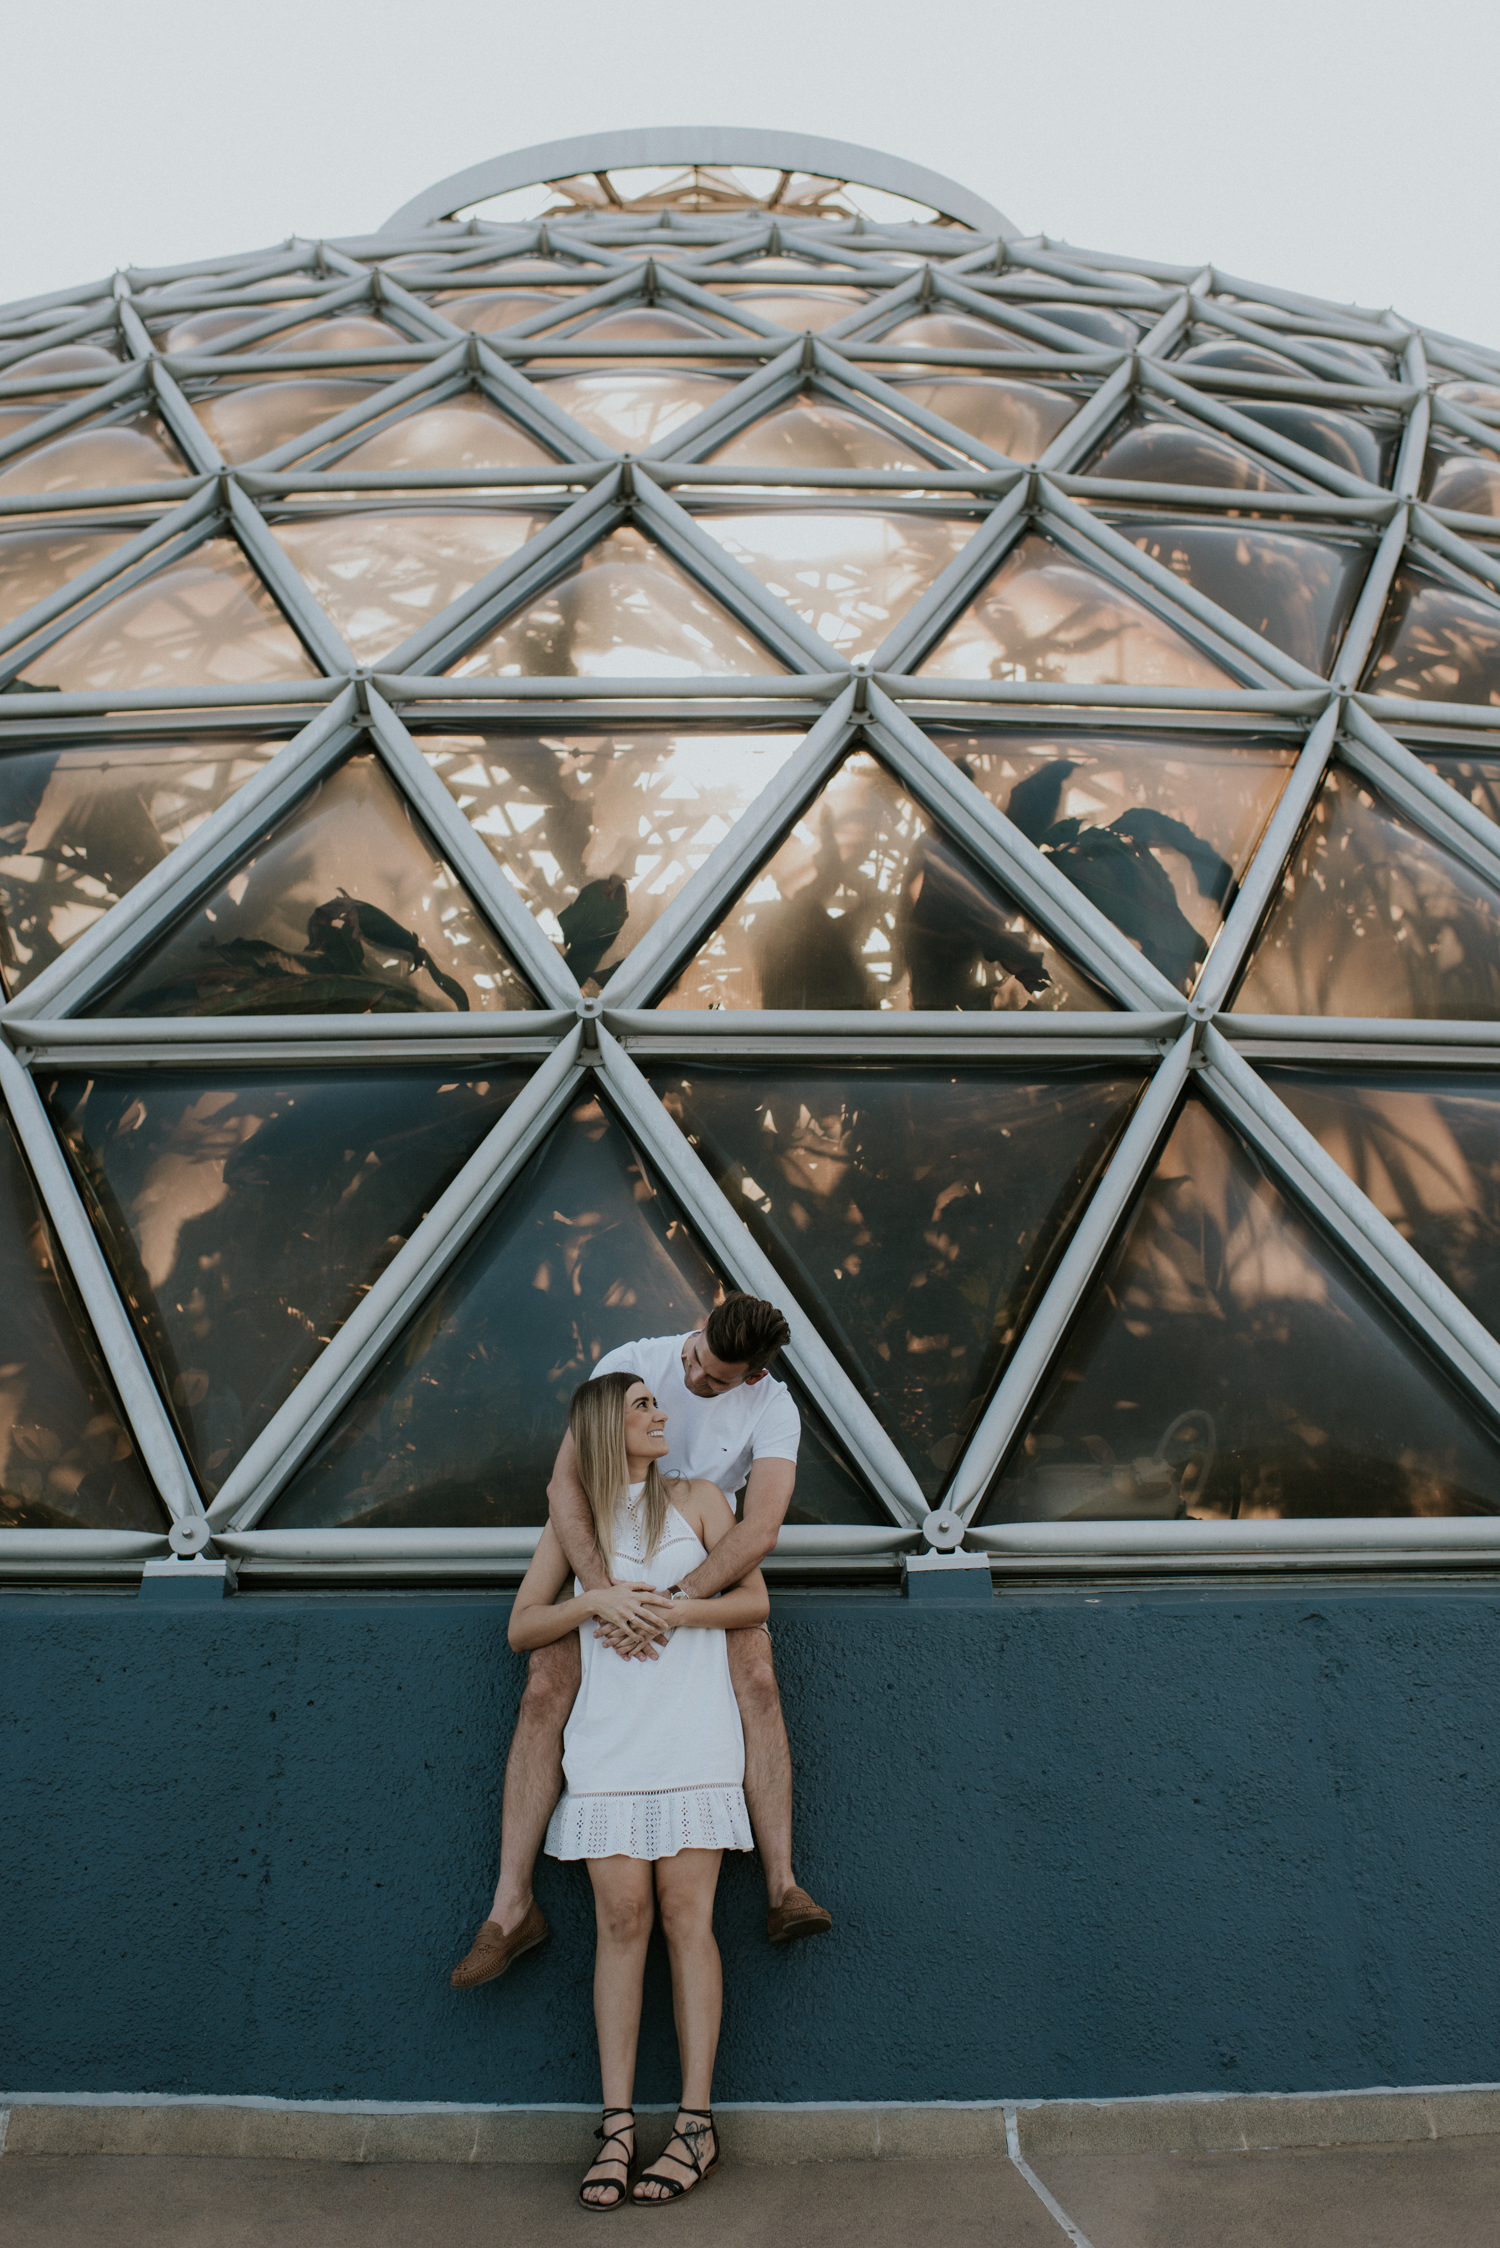 Brisbane Wedding Photographer | Engagement-Elopement Photography Botanical Gardens-2.jpg